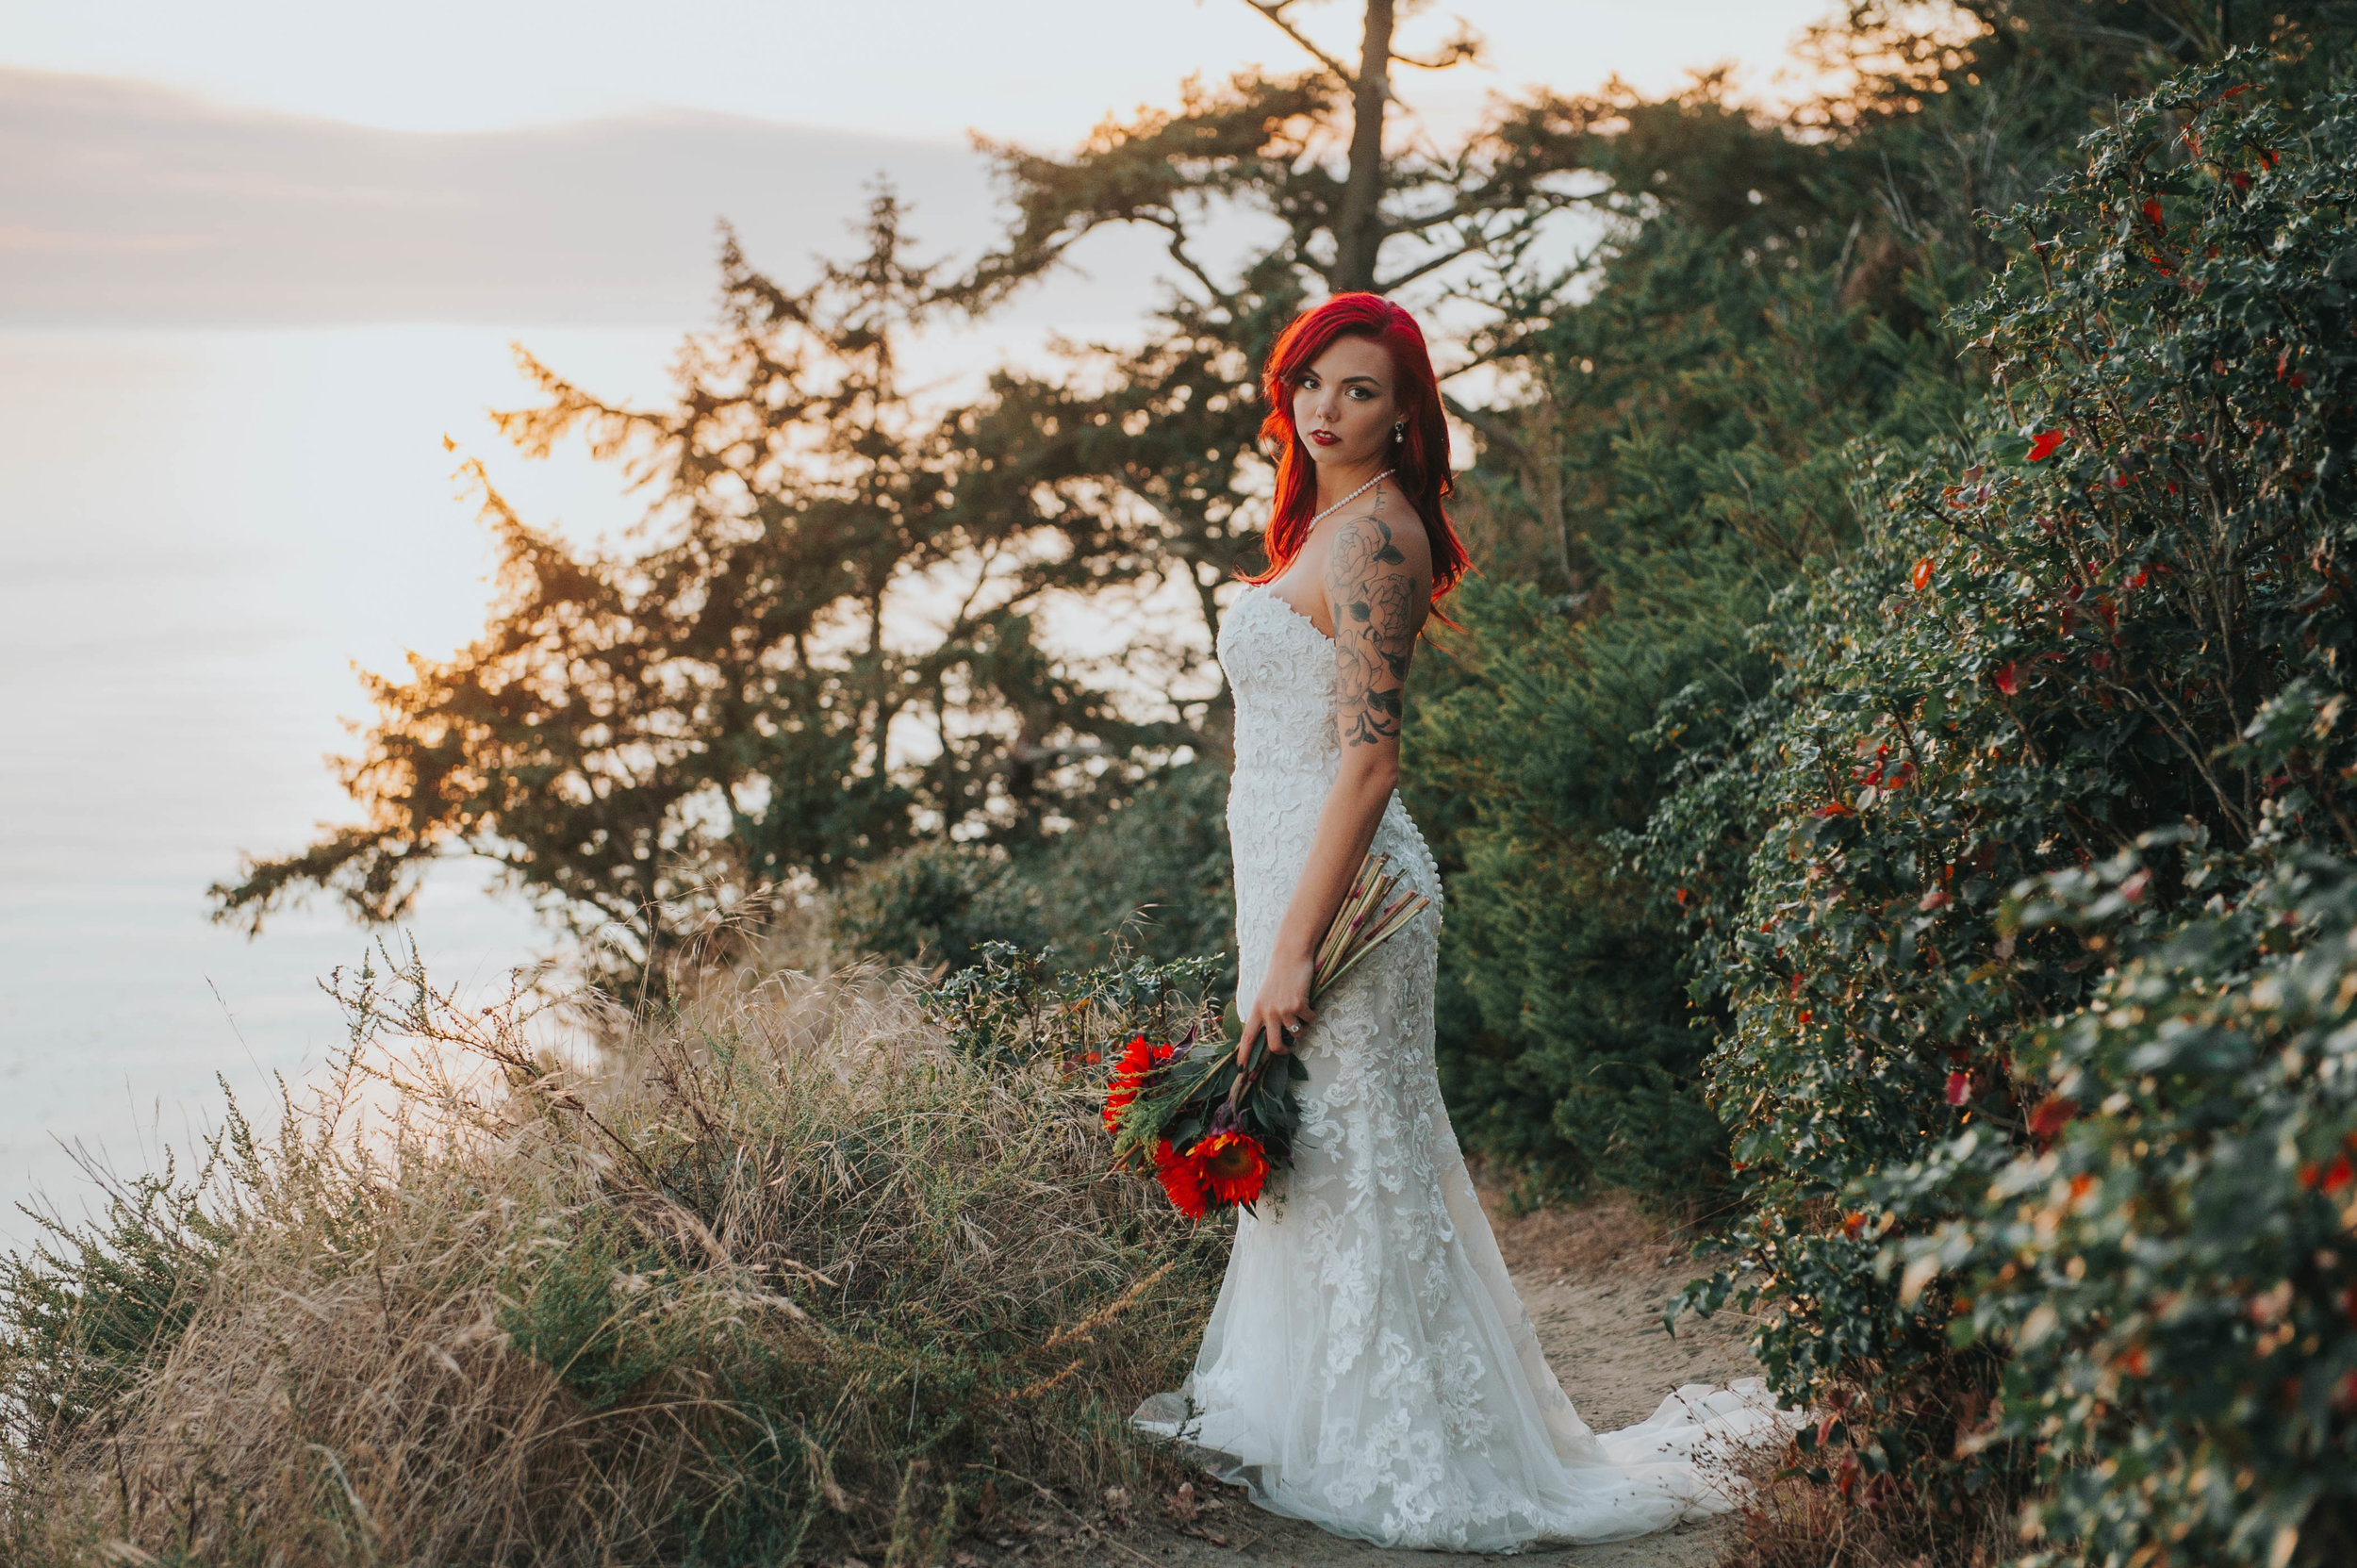 Whidbey-Island-Wedding-Photographer-J-Hodges (1 of 1)-2.jpg